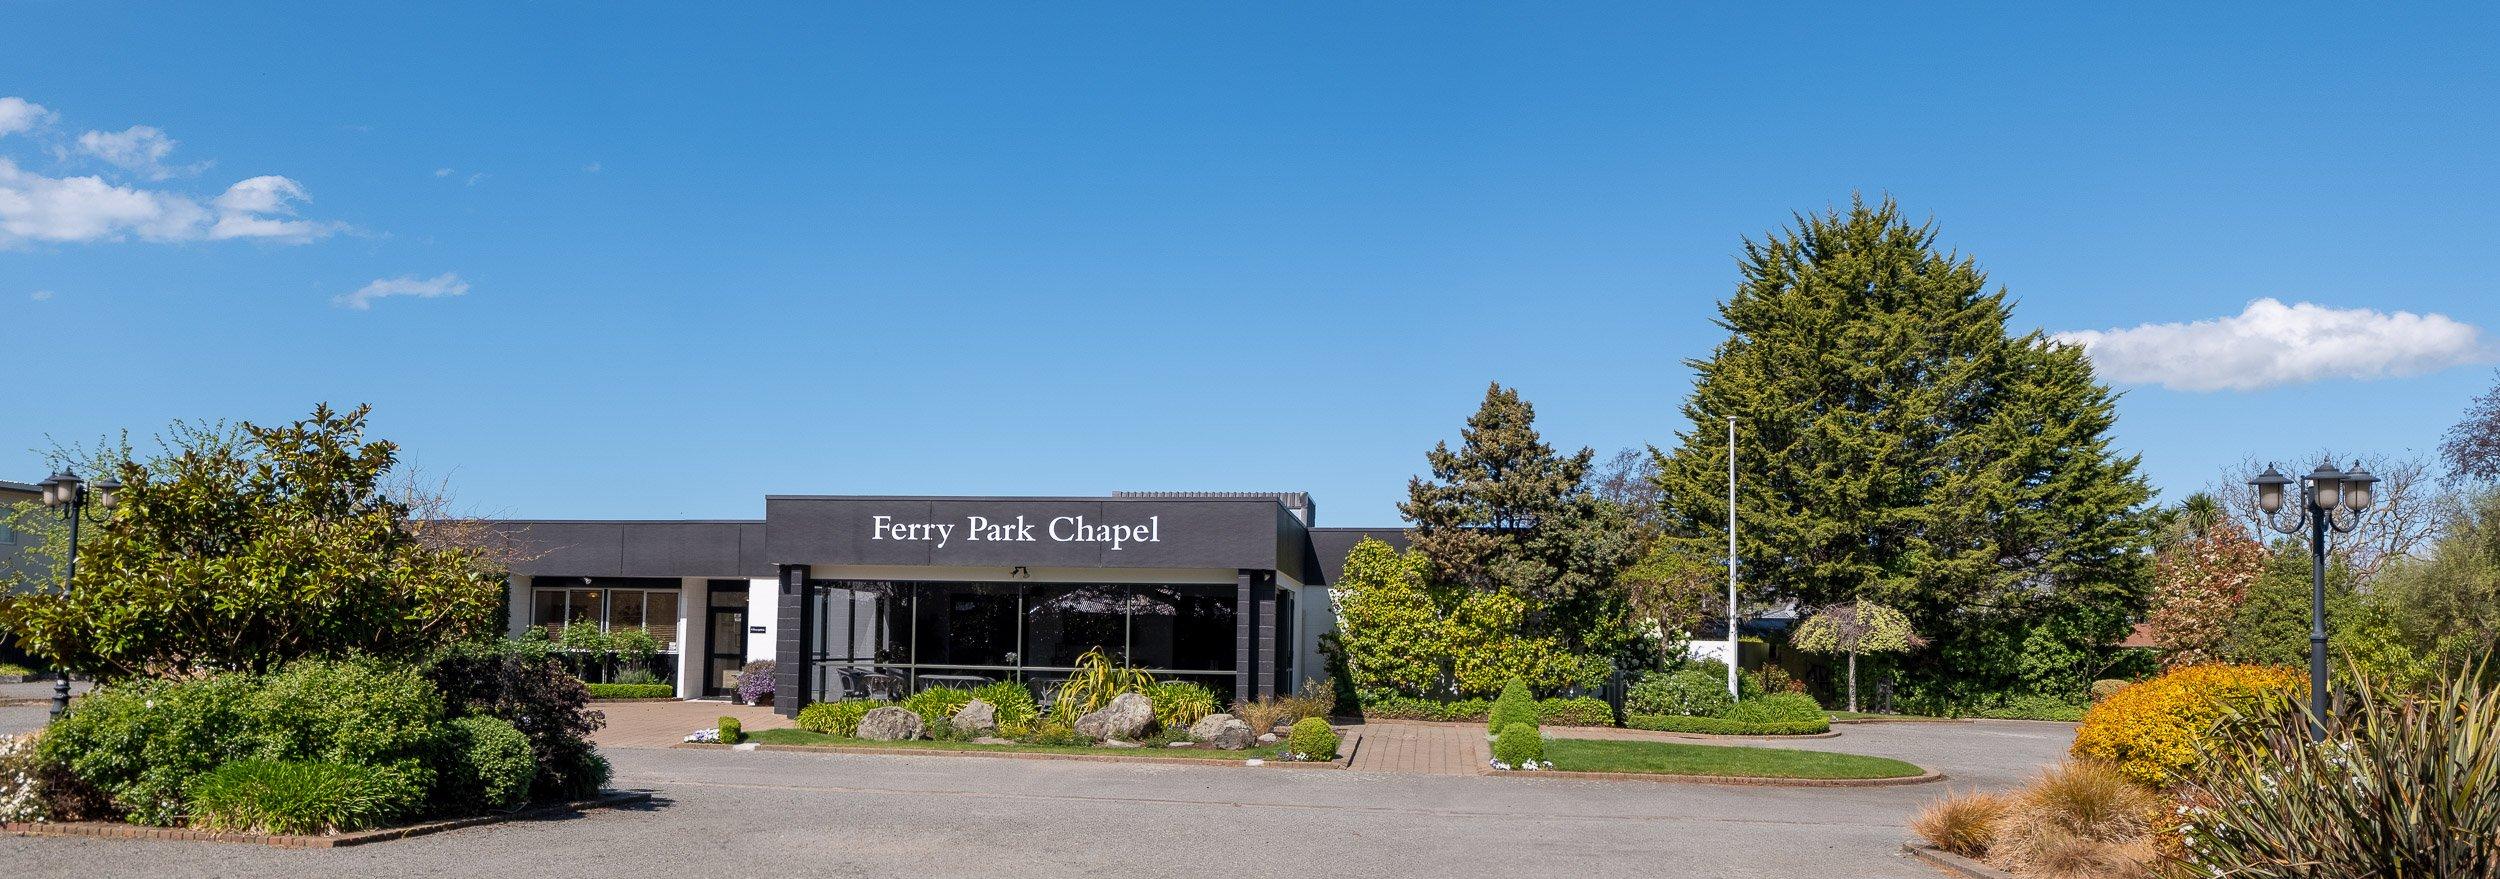 Ferry Park Chapel Front Entrance - Venues | Bell, Lamb & Trotter